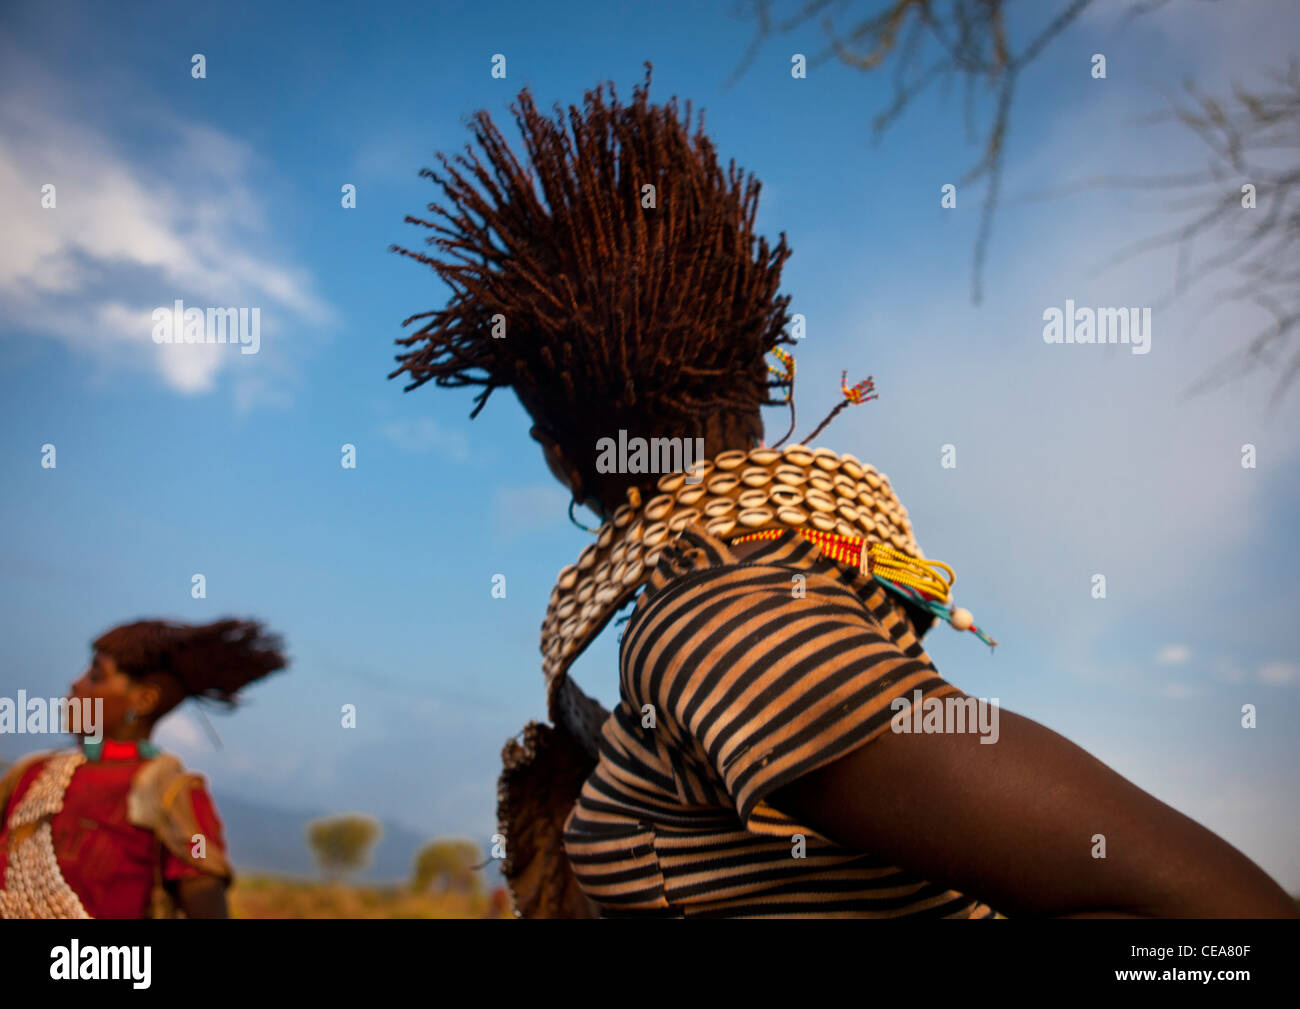 Banna donna agitando i suoi capelli Bull Jumping cerimonia Etiopia Immagini Stock